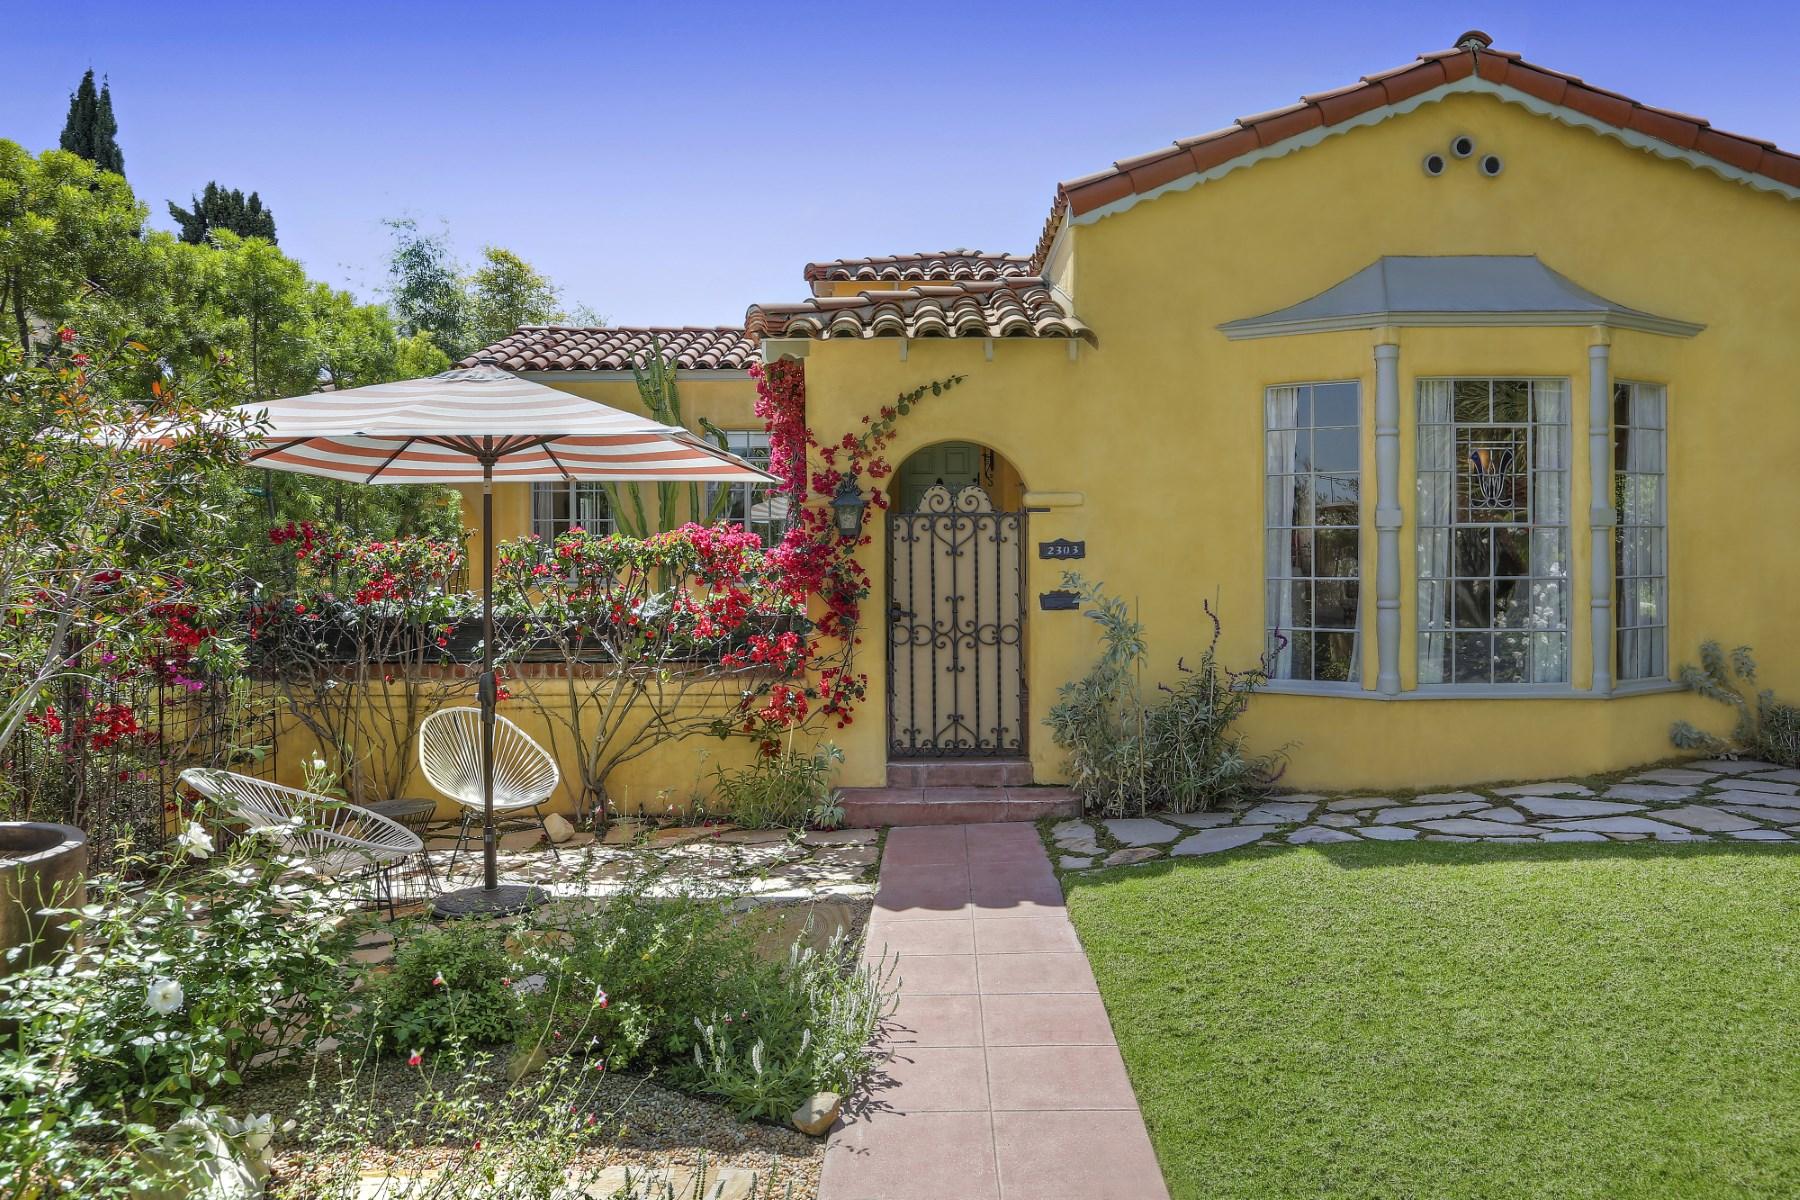 Single Family Home for Sale at 2303 Wayne Avenue Los Feliz, Los Angeles, California, 90027 United States